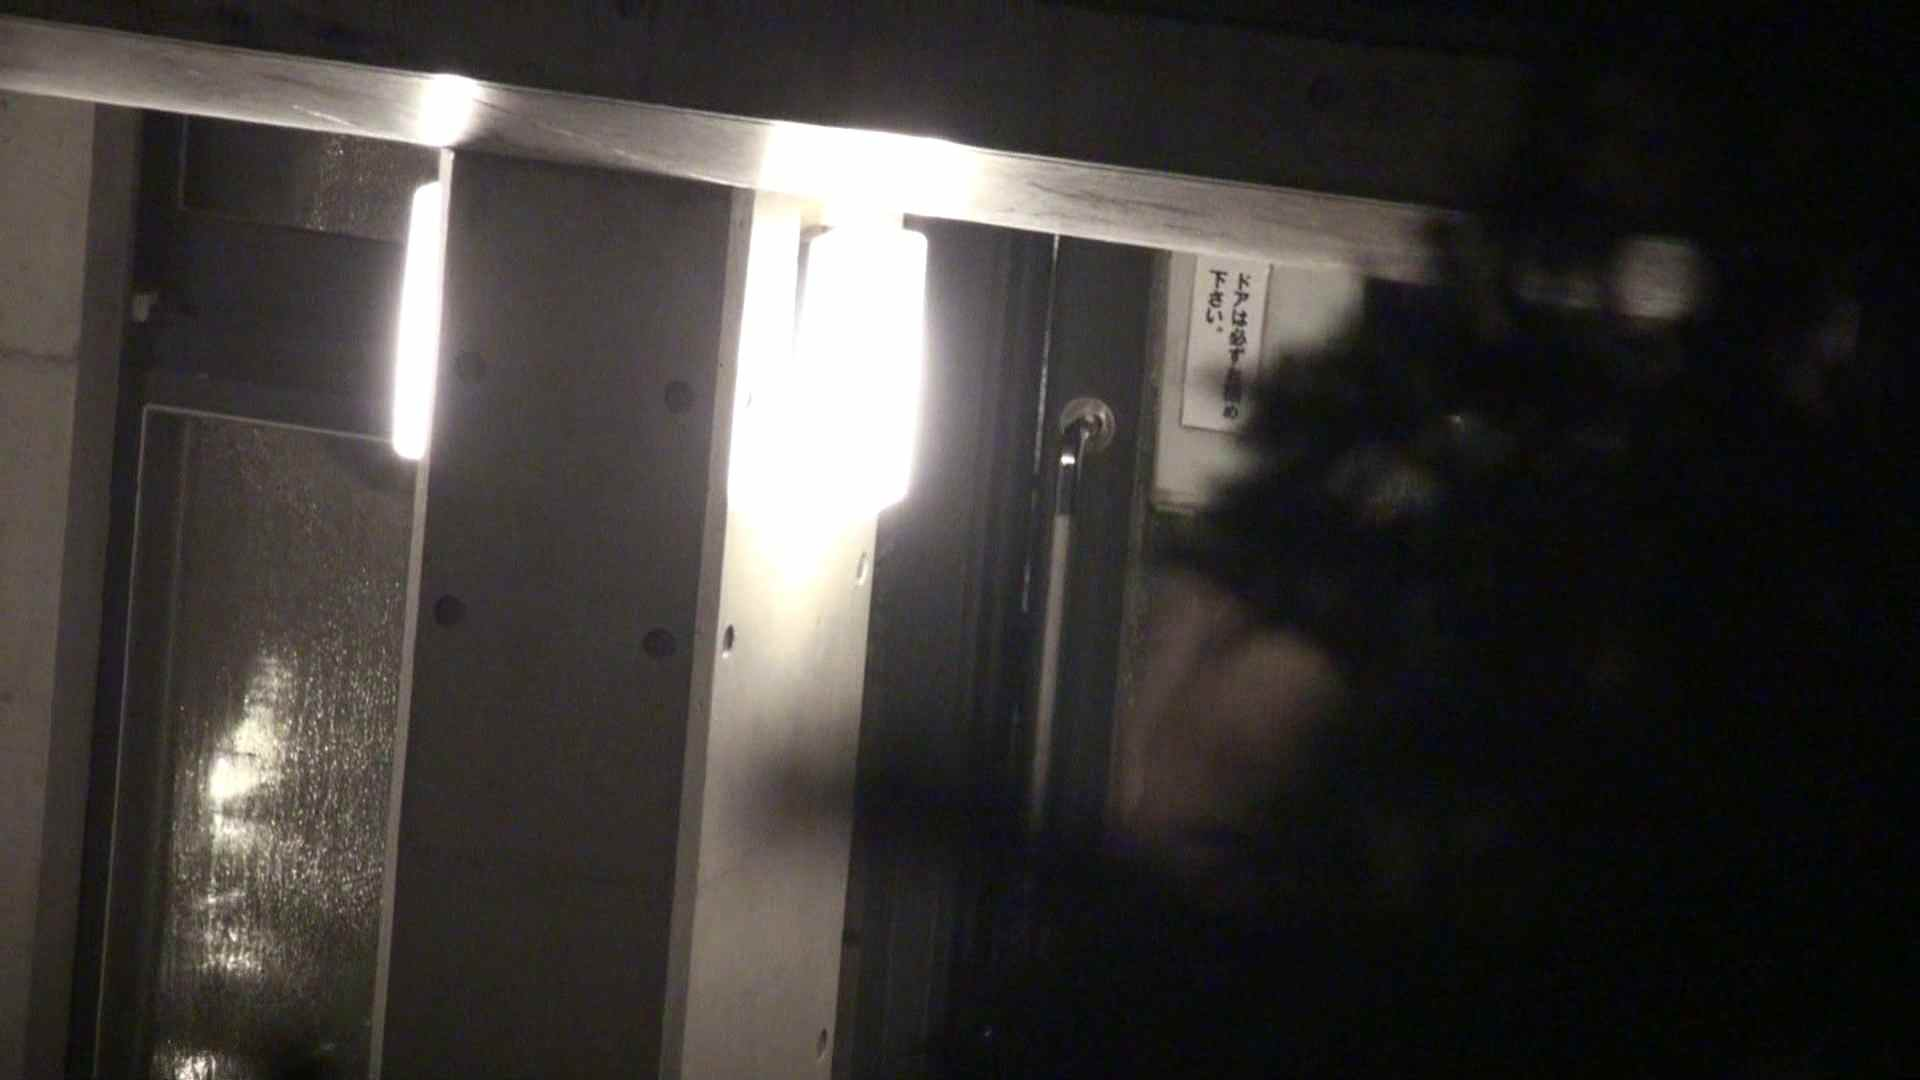 Aquaな露天風呂Vol.357 盗撮 のぞき動画画像 99連発 26